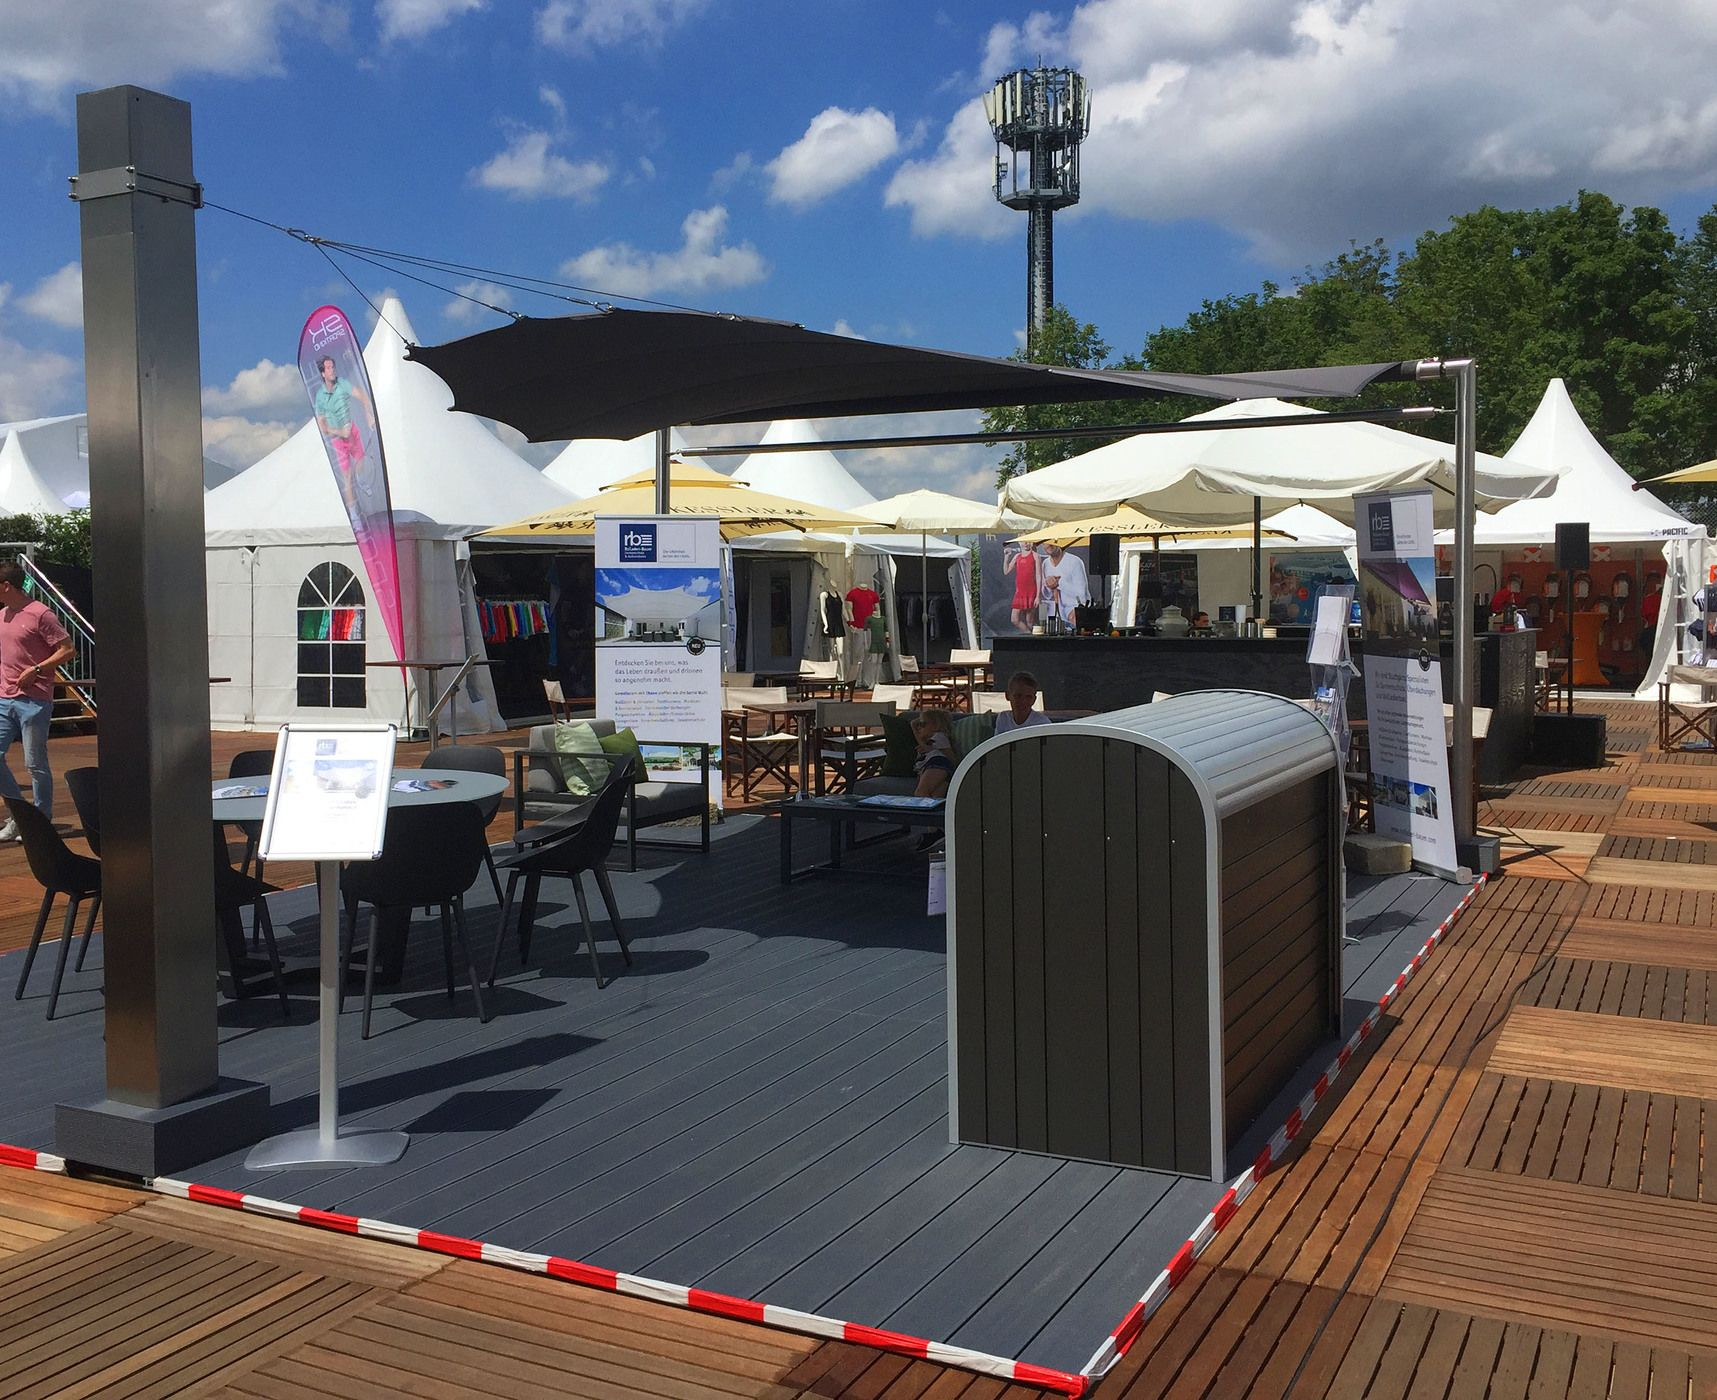 Referenzen-Rolladen-Bauer- Stuttgart#C4sun#Sonnensegel#lElips4sun ...